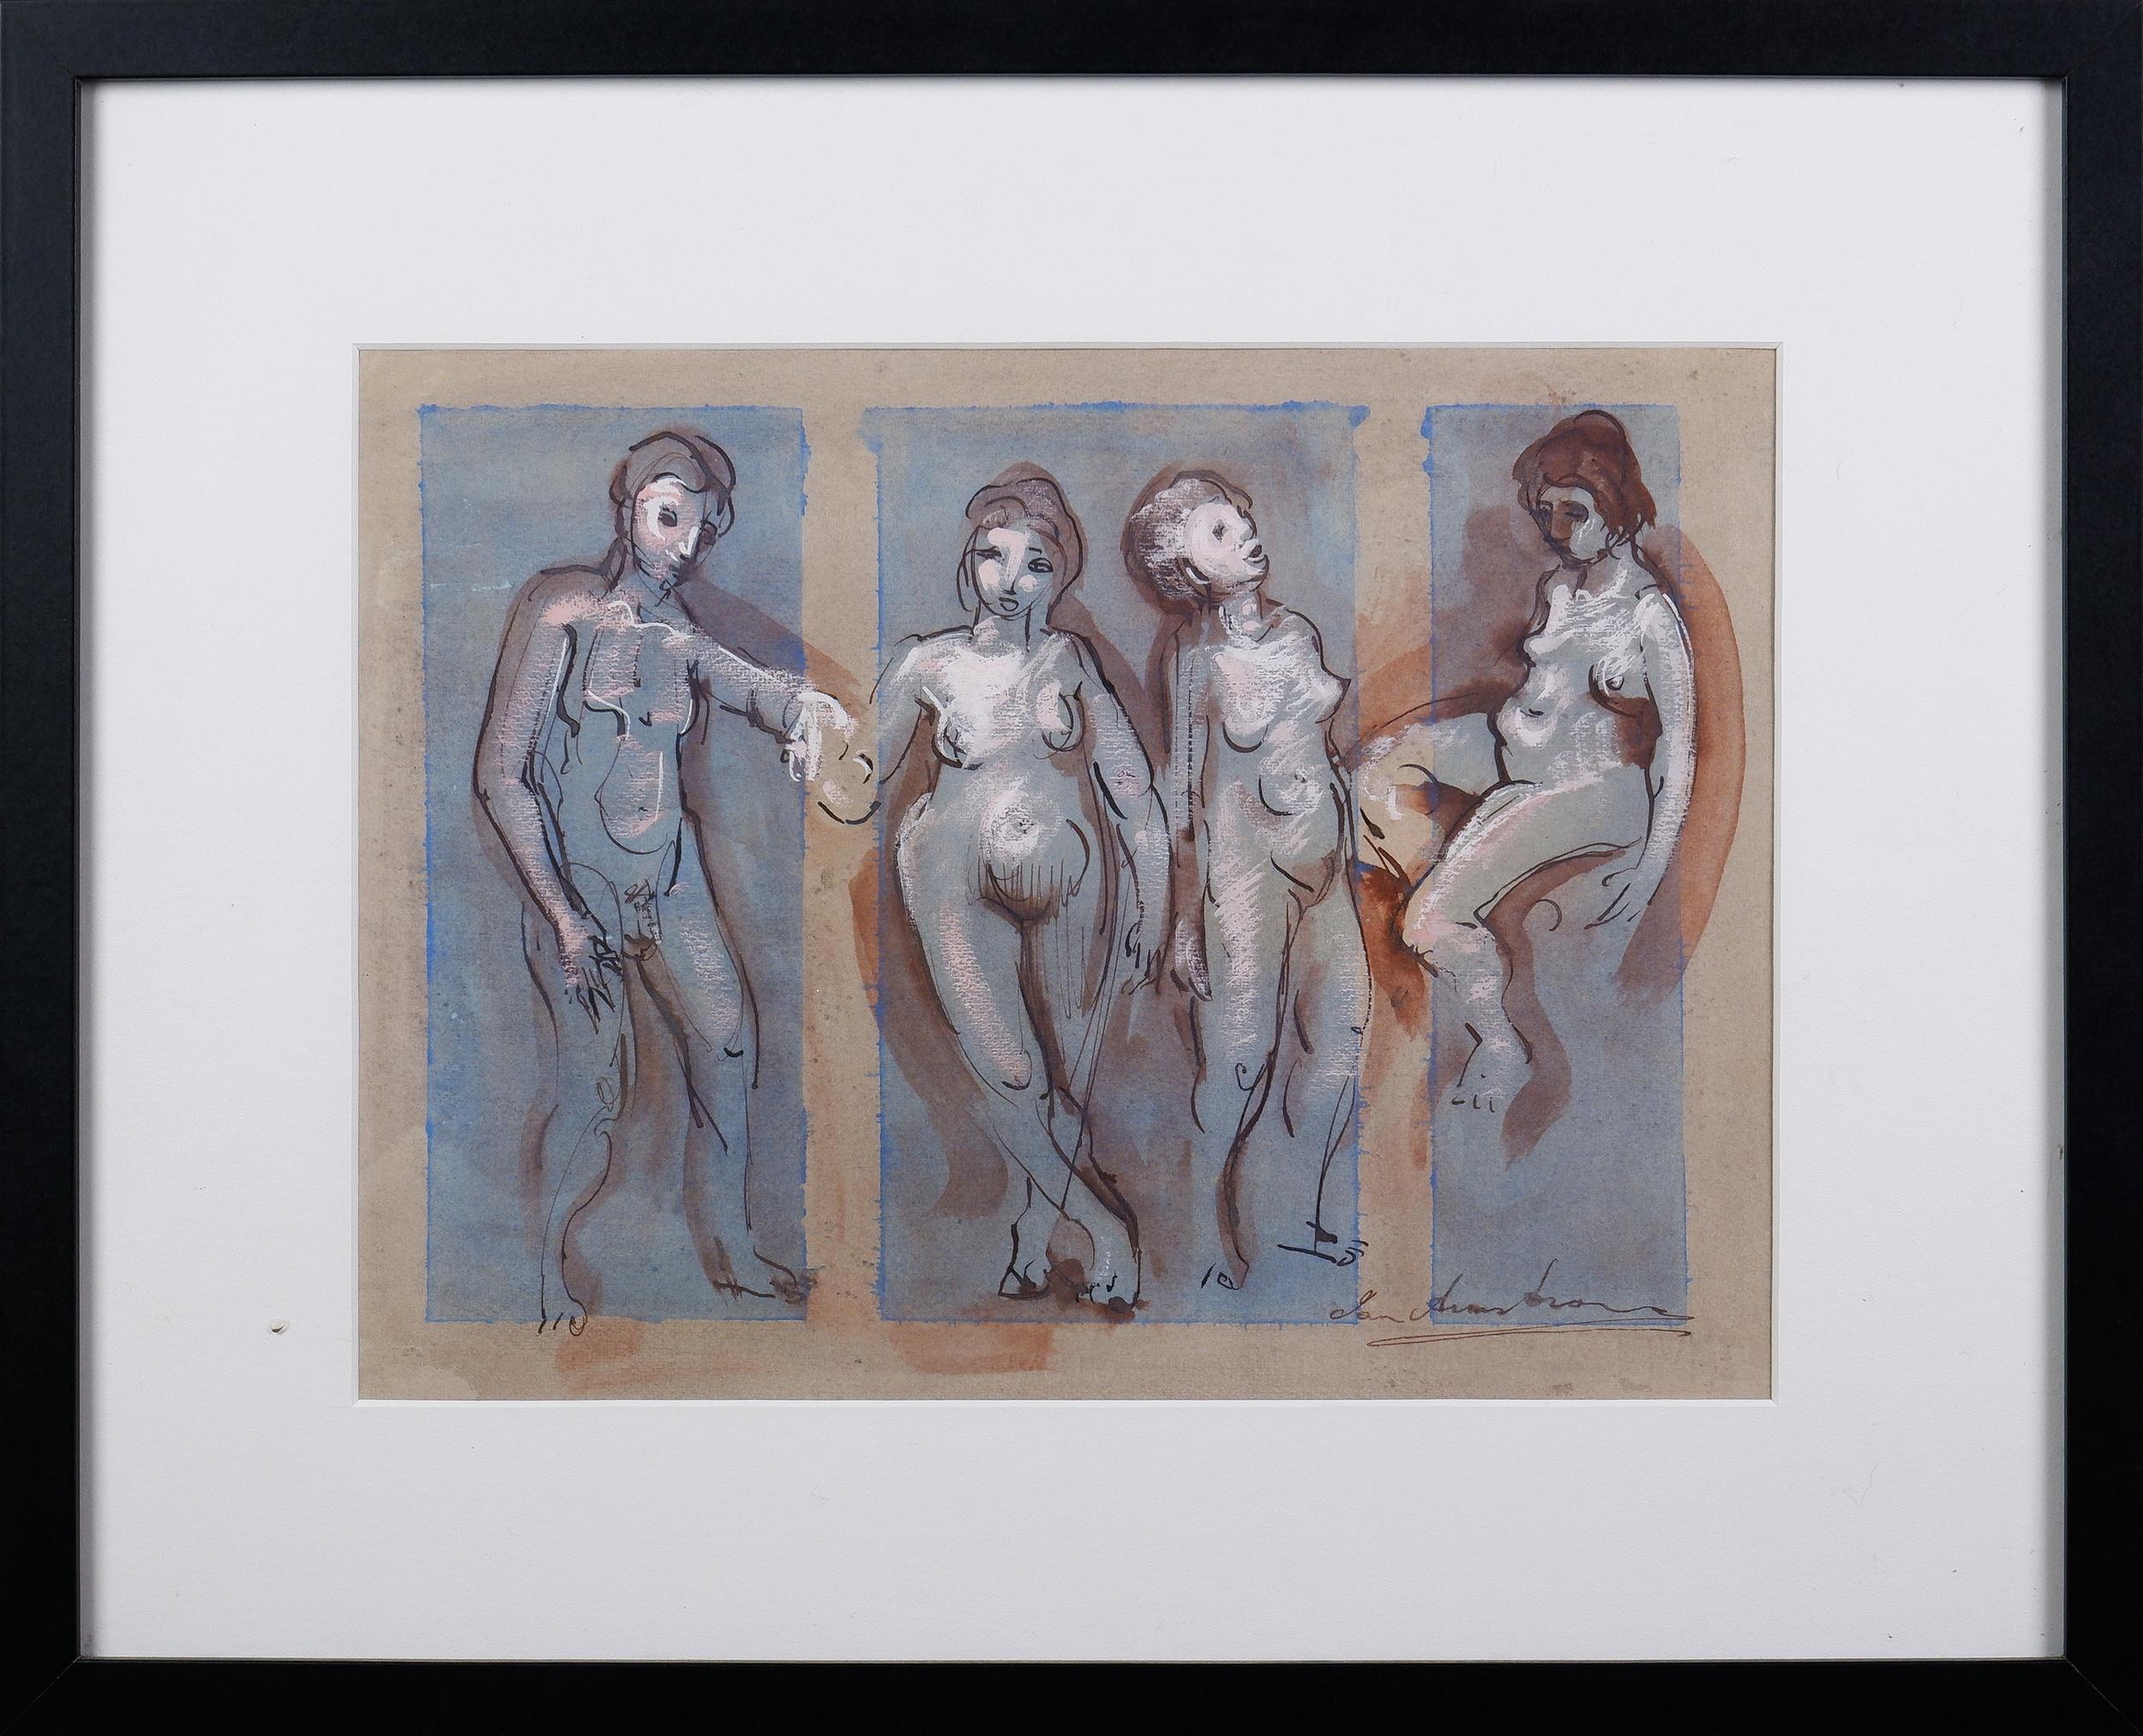 'Ian Armstrong (1923-2005), Untitled (Figure Study) 1955, Ink & Gouache, 25.5 x 34.5 cm'